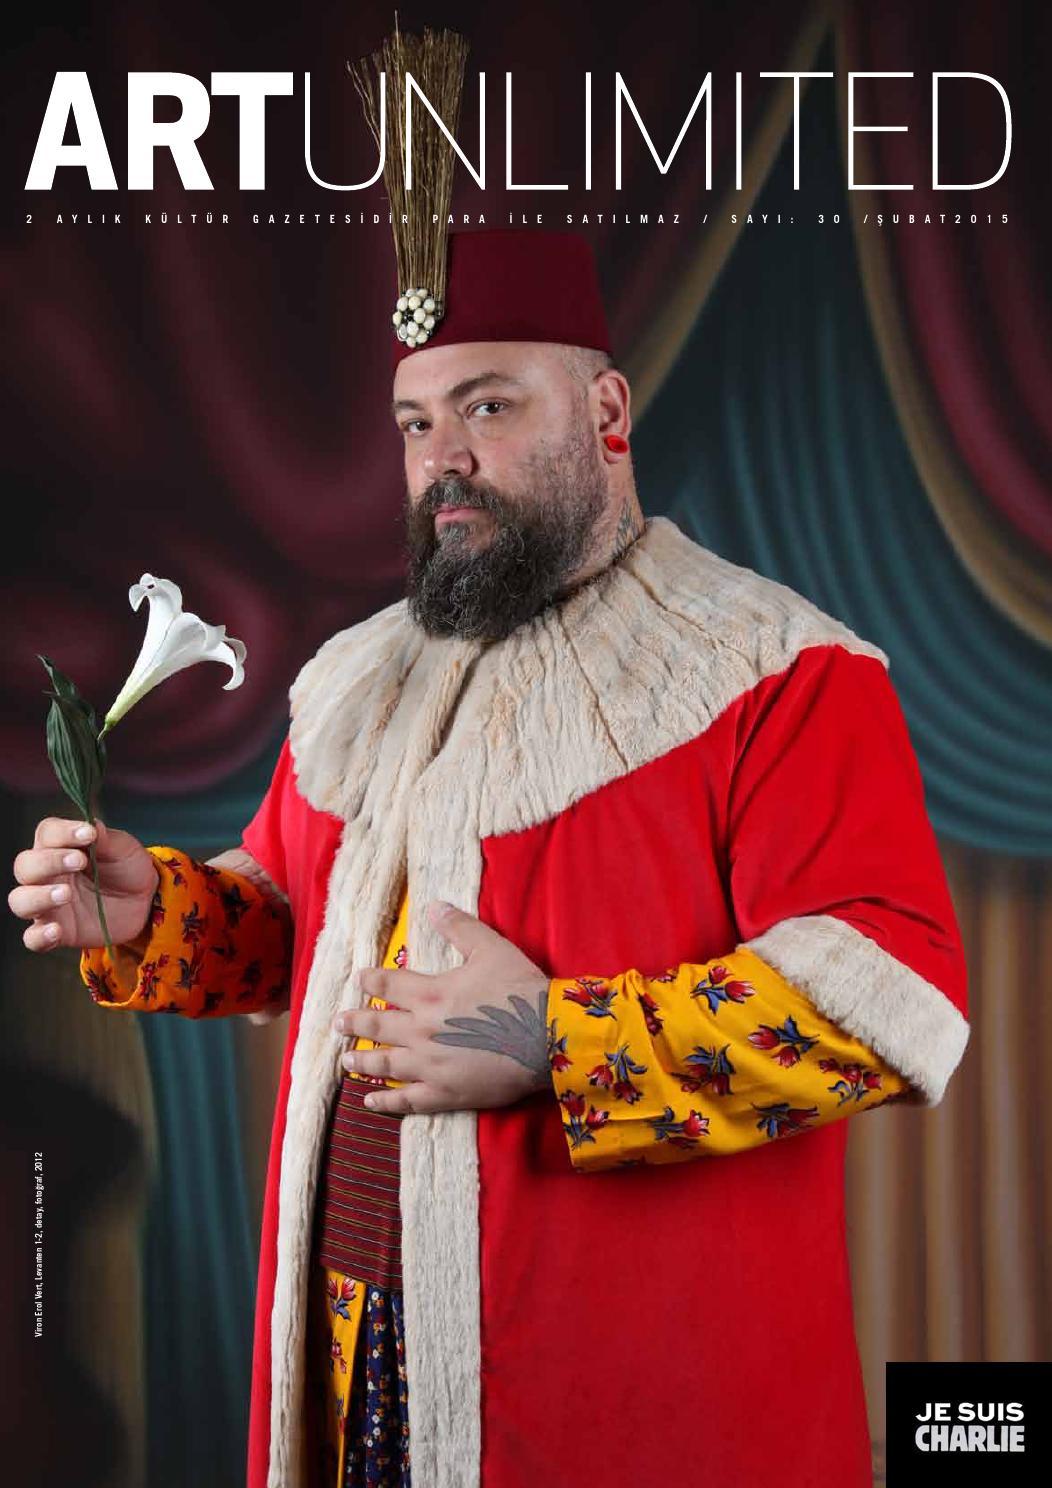 Et Cetera Tiyatro: repertuar, topluluk